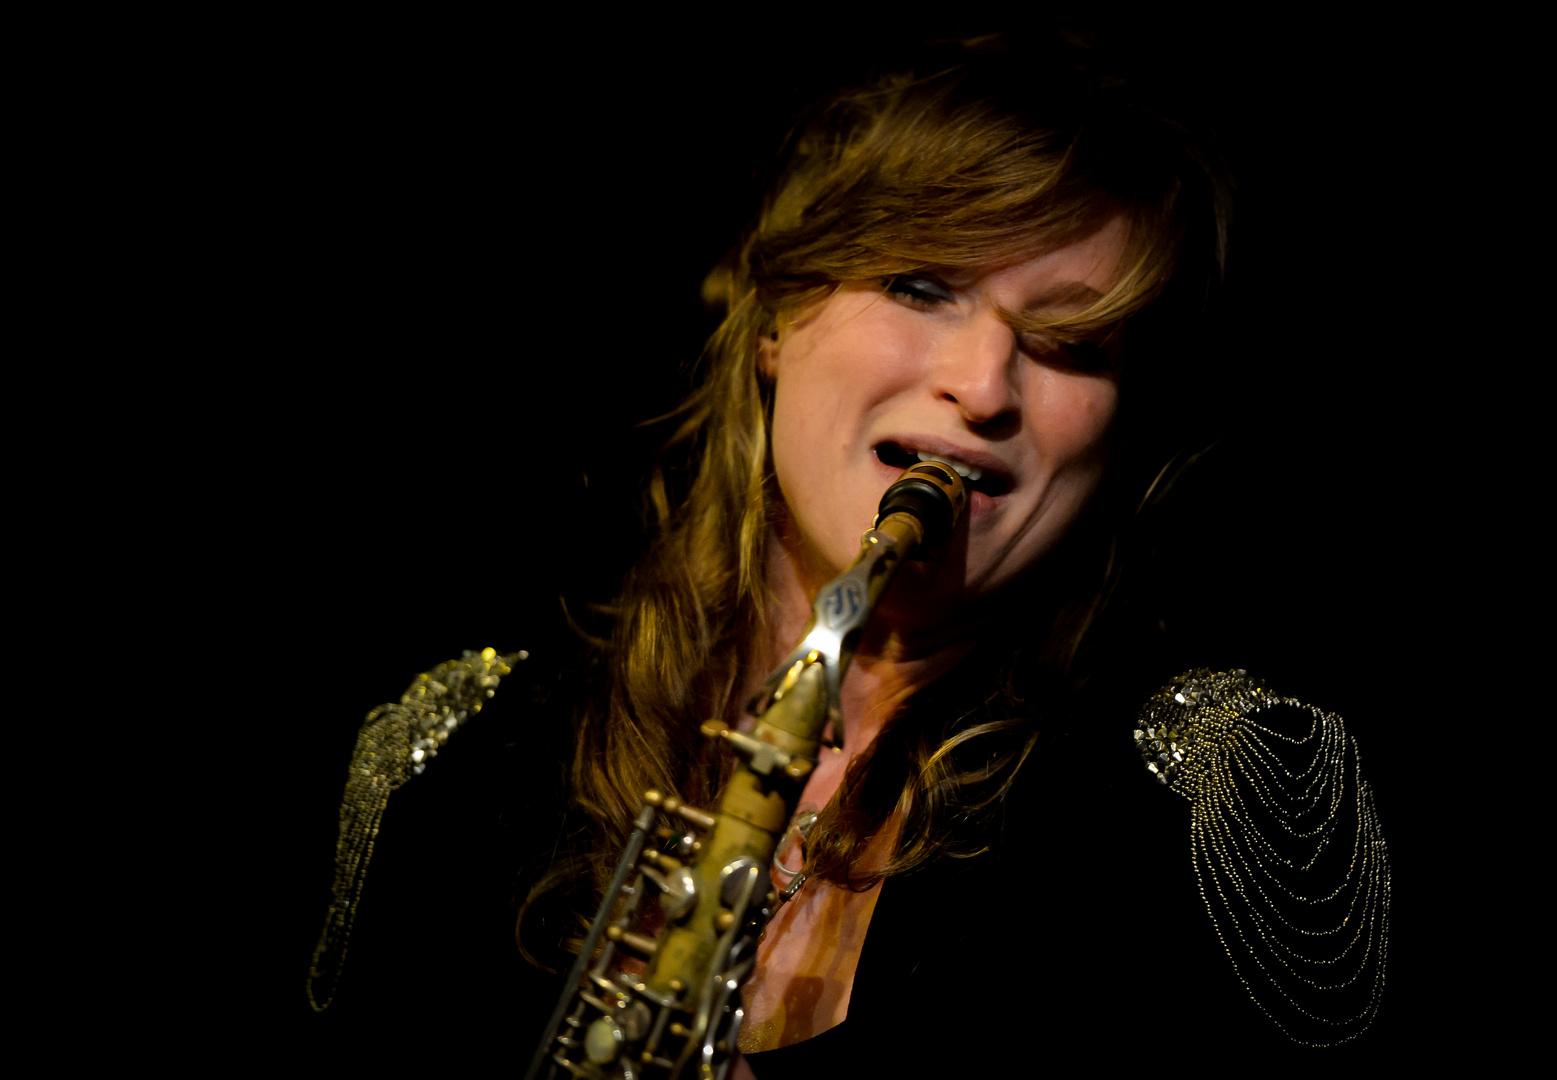 Nicole Jo